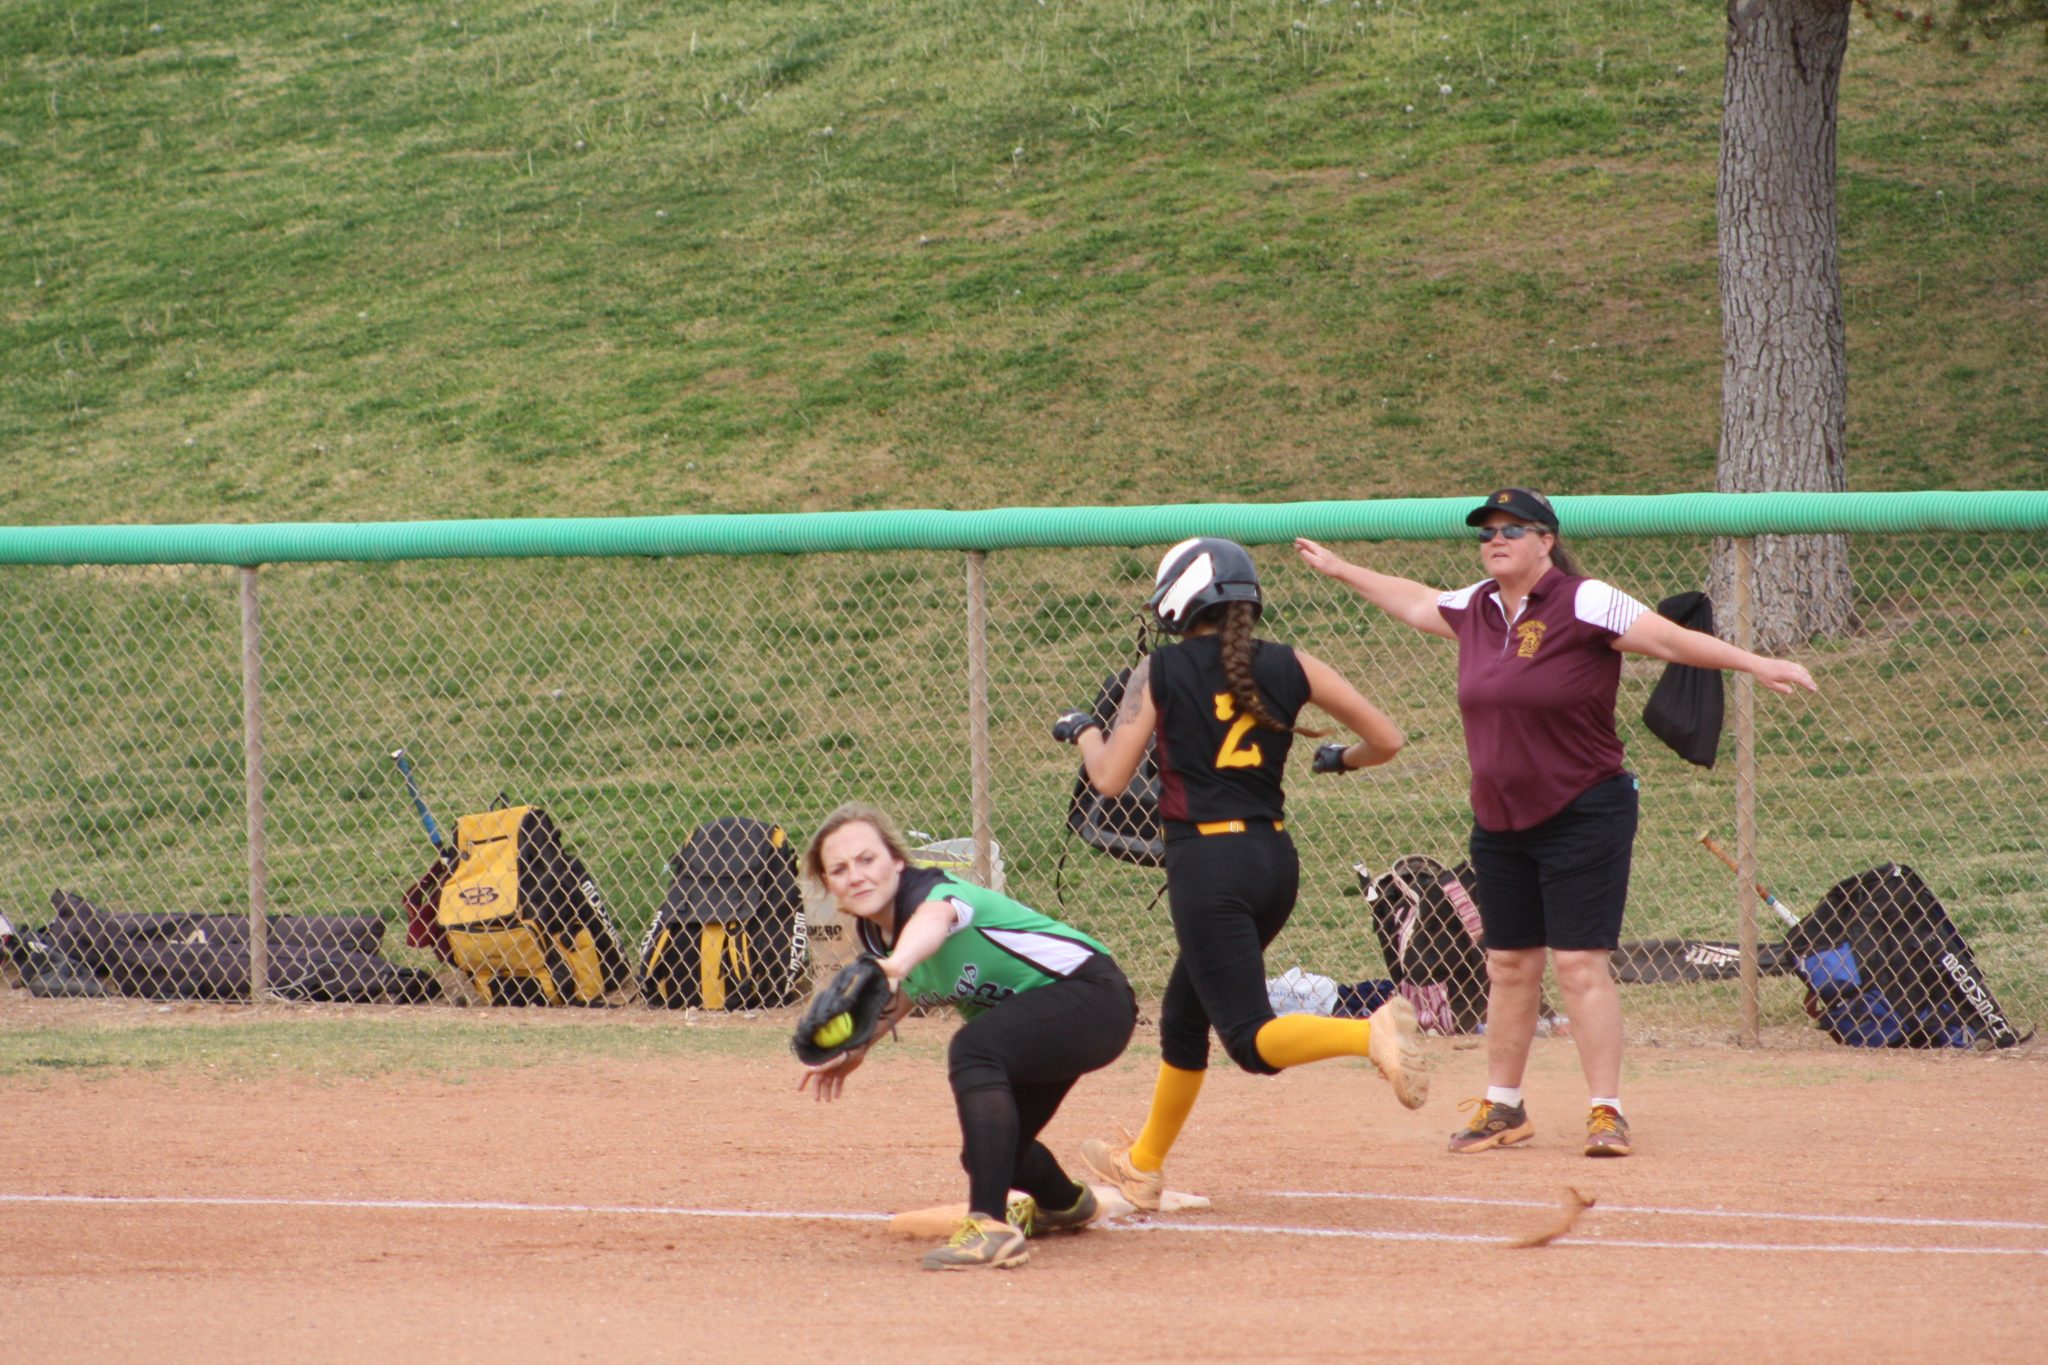 Trojans shut down Lady Dogs 10-0